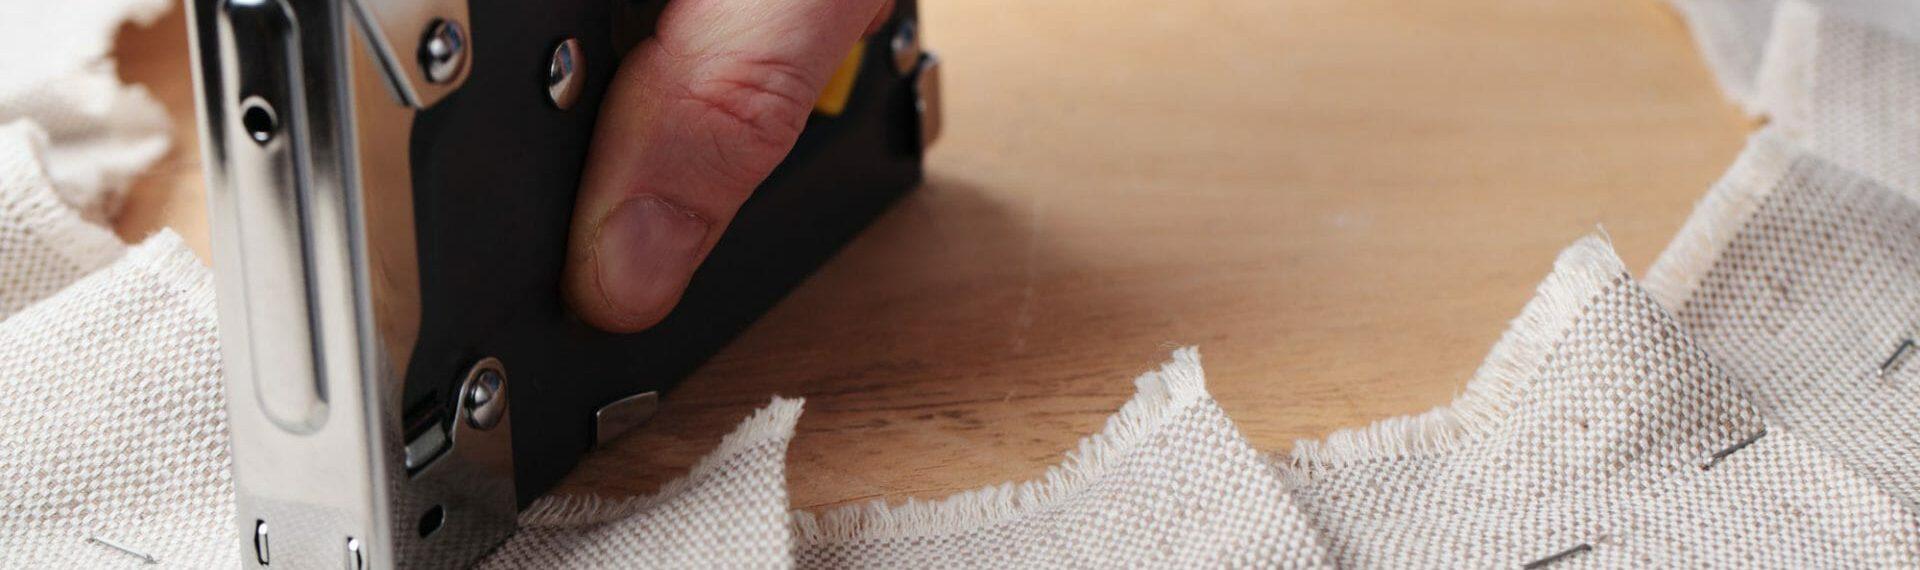 upholstery using staple gun to upholster chair seat